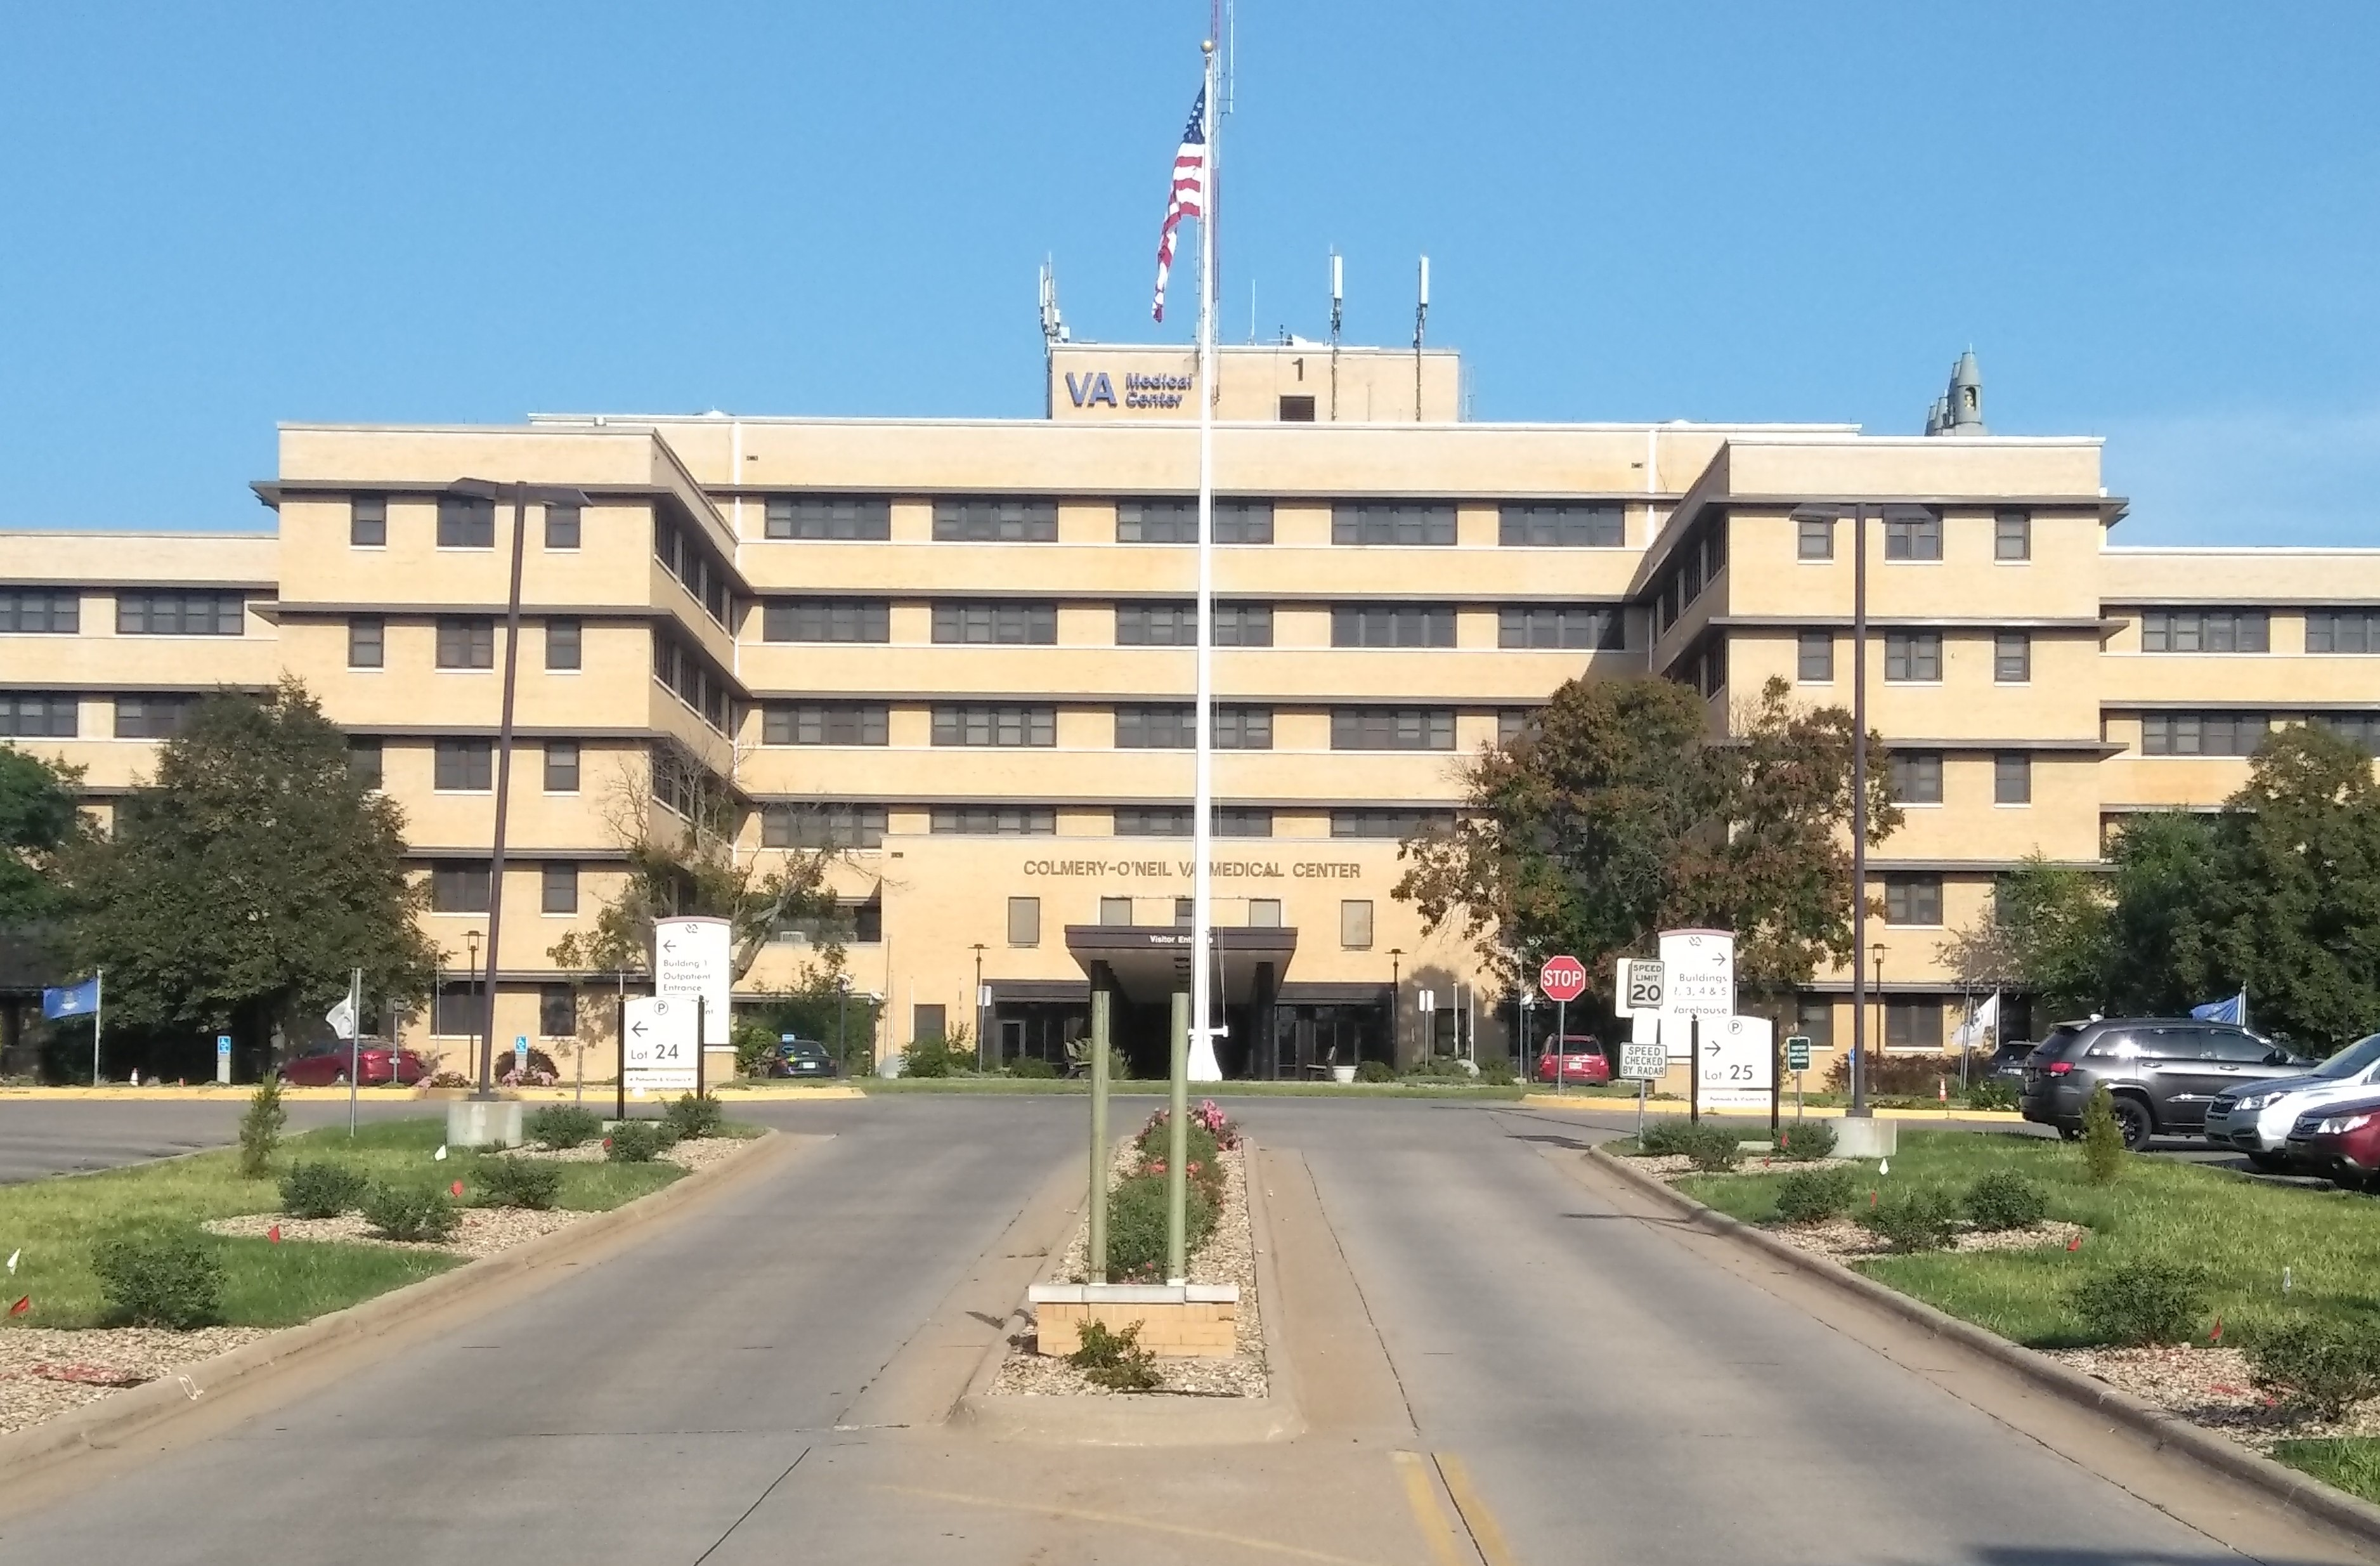 Va Topeka Ks >> File Colmery O Neil Va Medical Center Topeka Ks Jpg